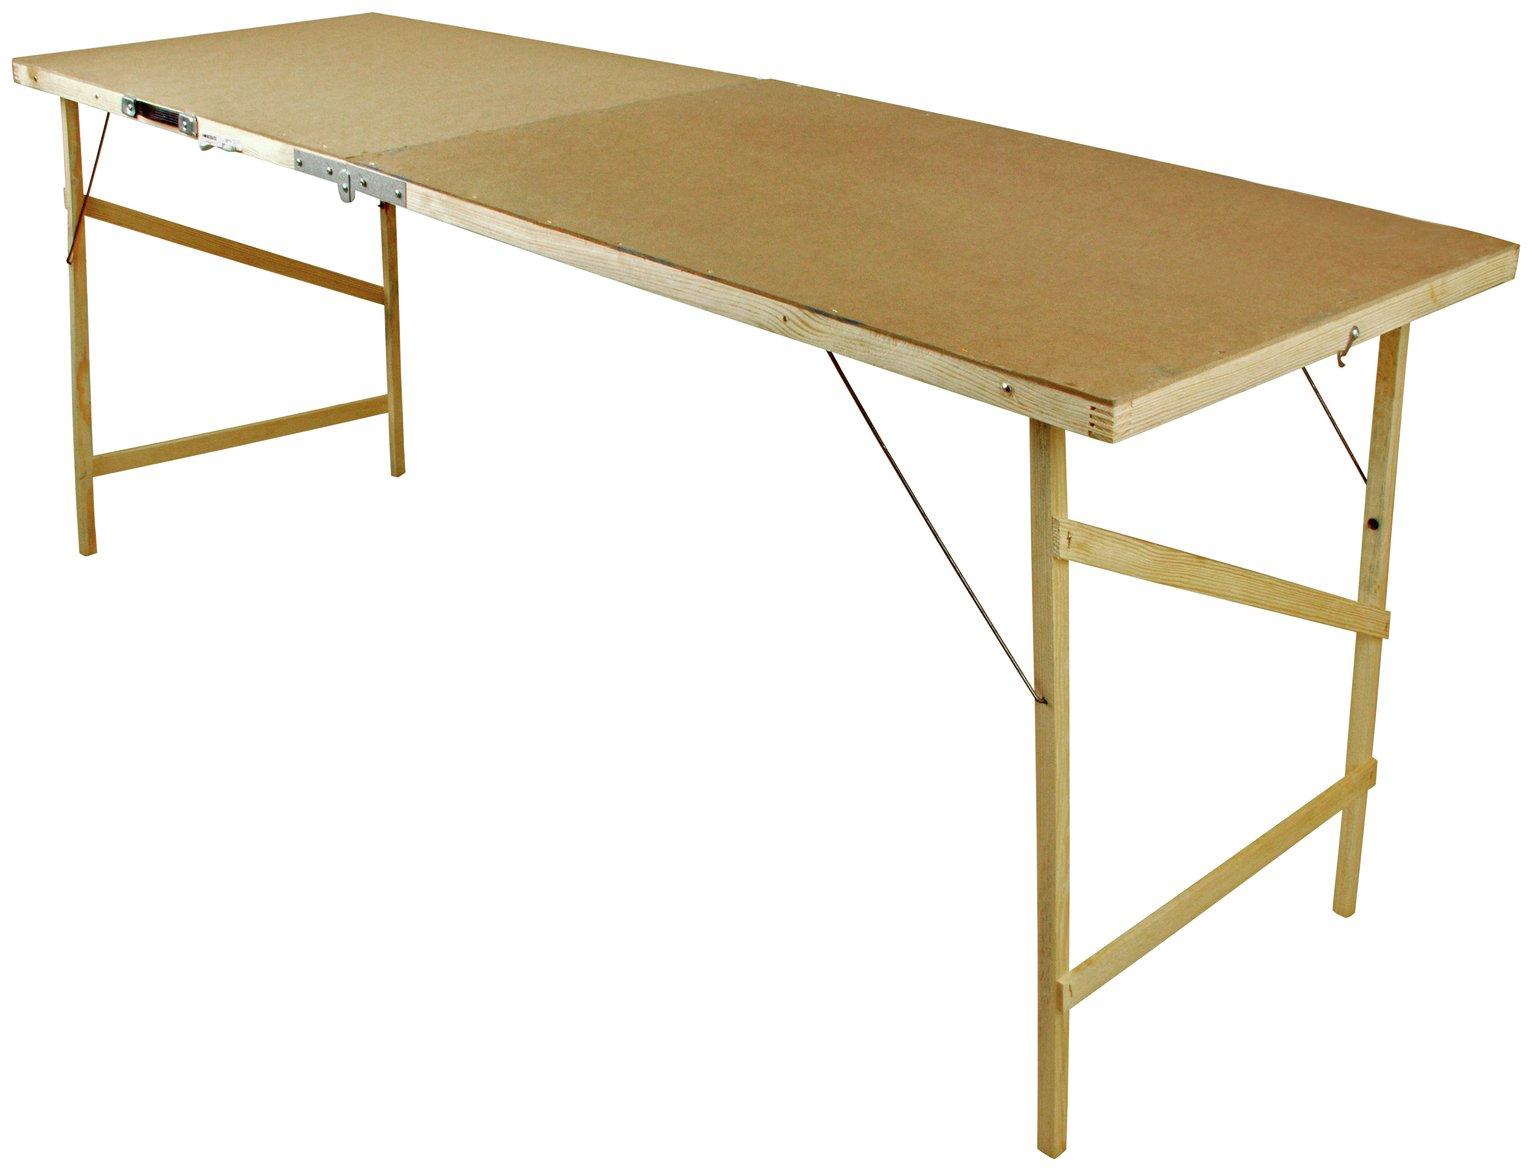 Jodla Decorating & Pasting Table